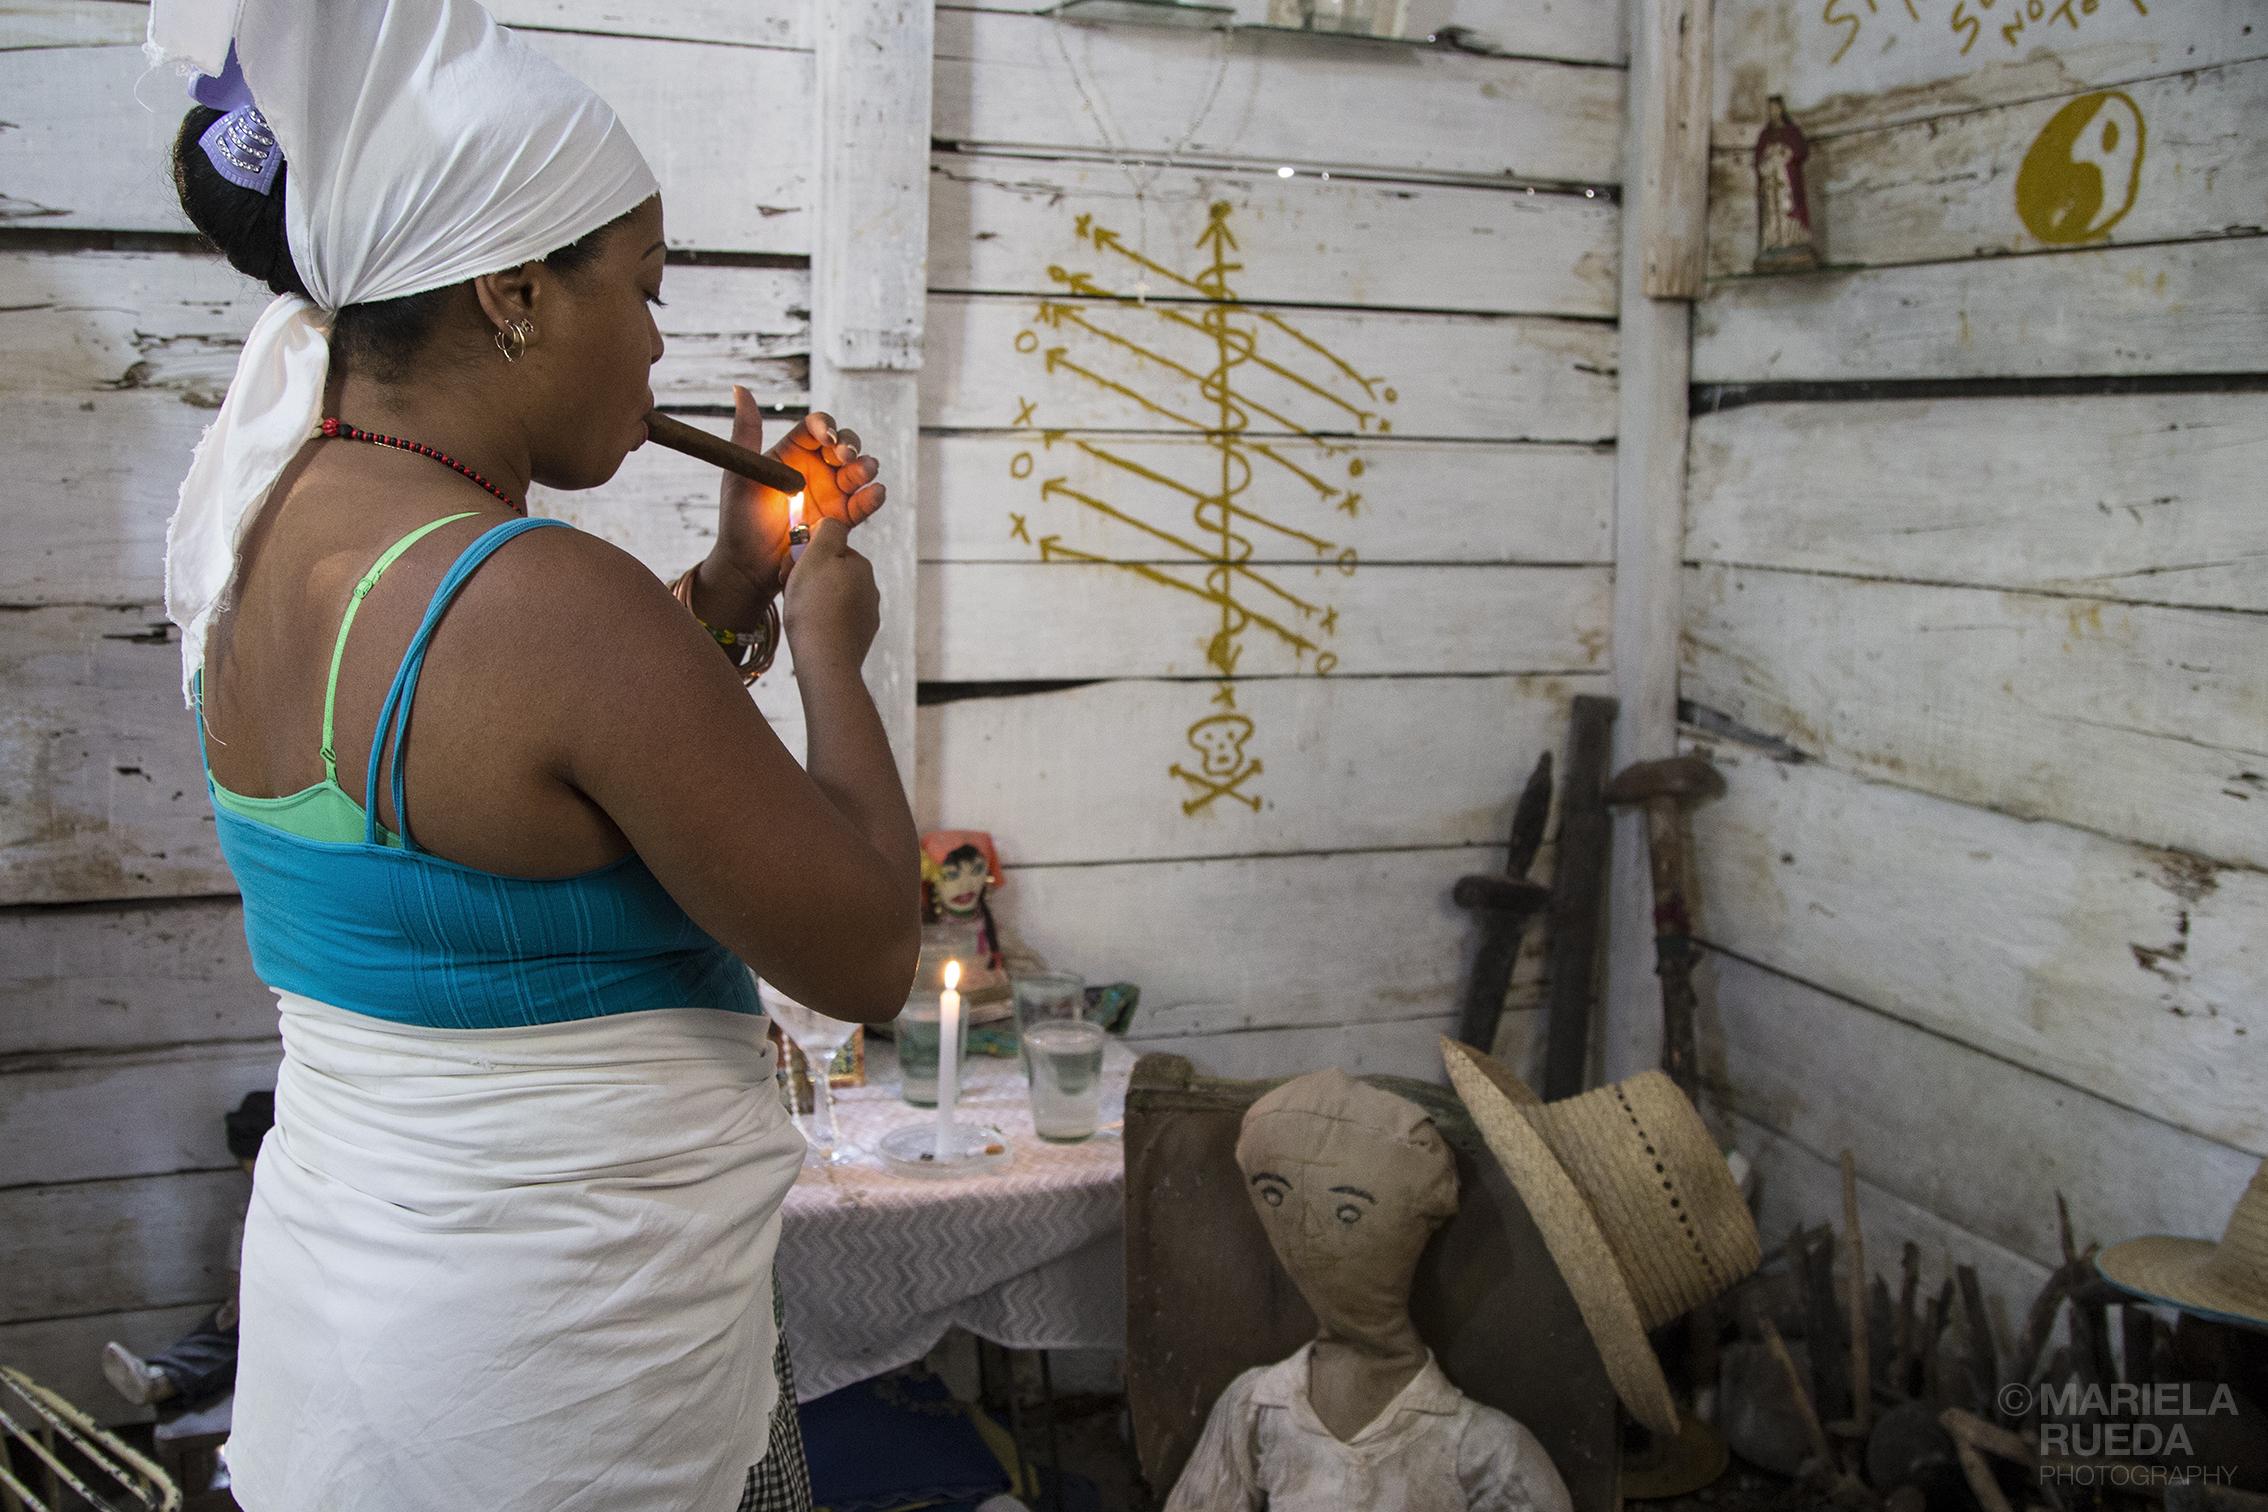 Orishas  Santeria in Cuba  - mariela rueda alvarez